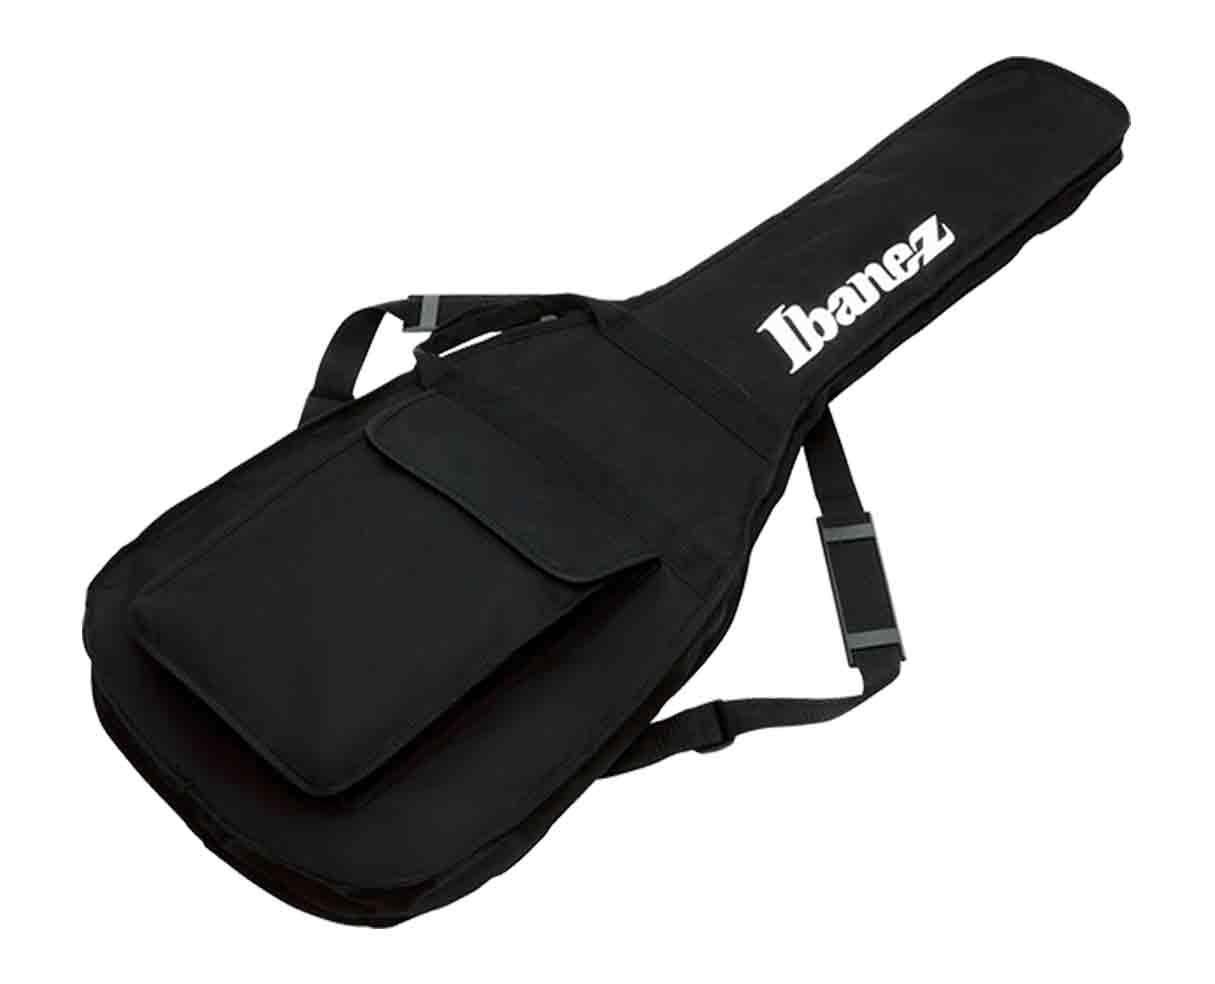 Ibanez IGB101 Gig Bag for Electric Guitar